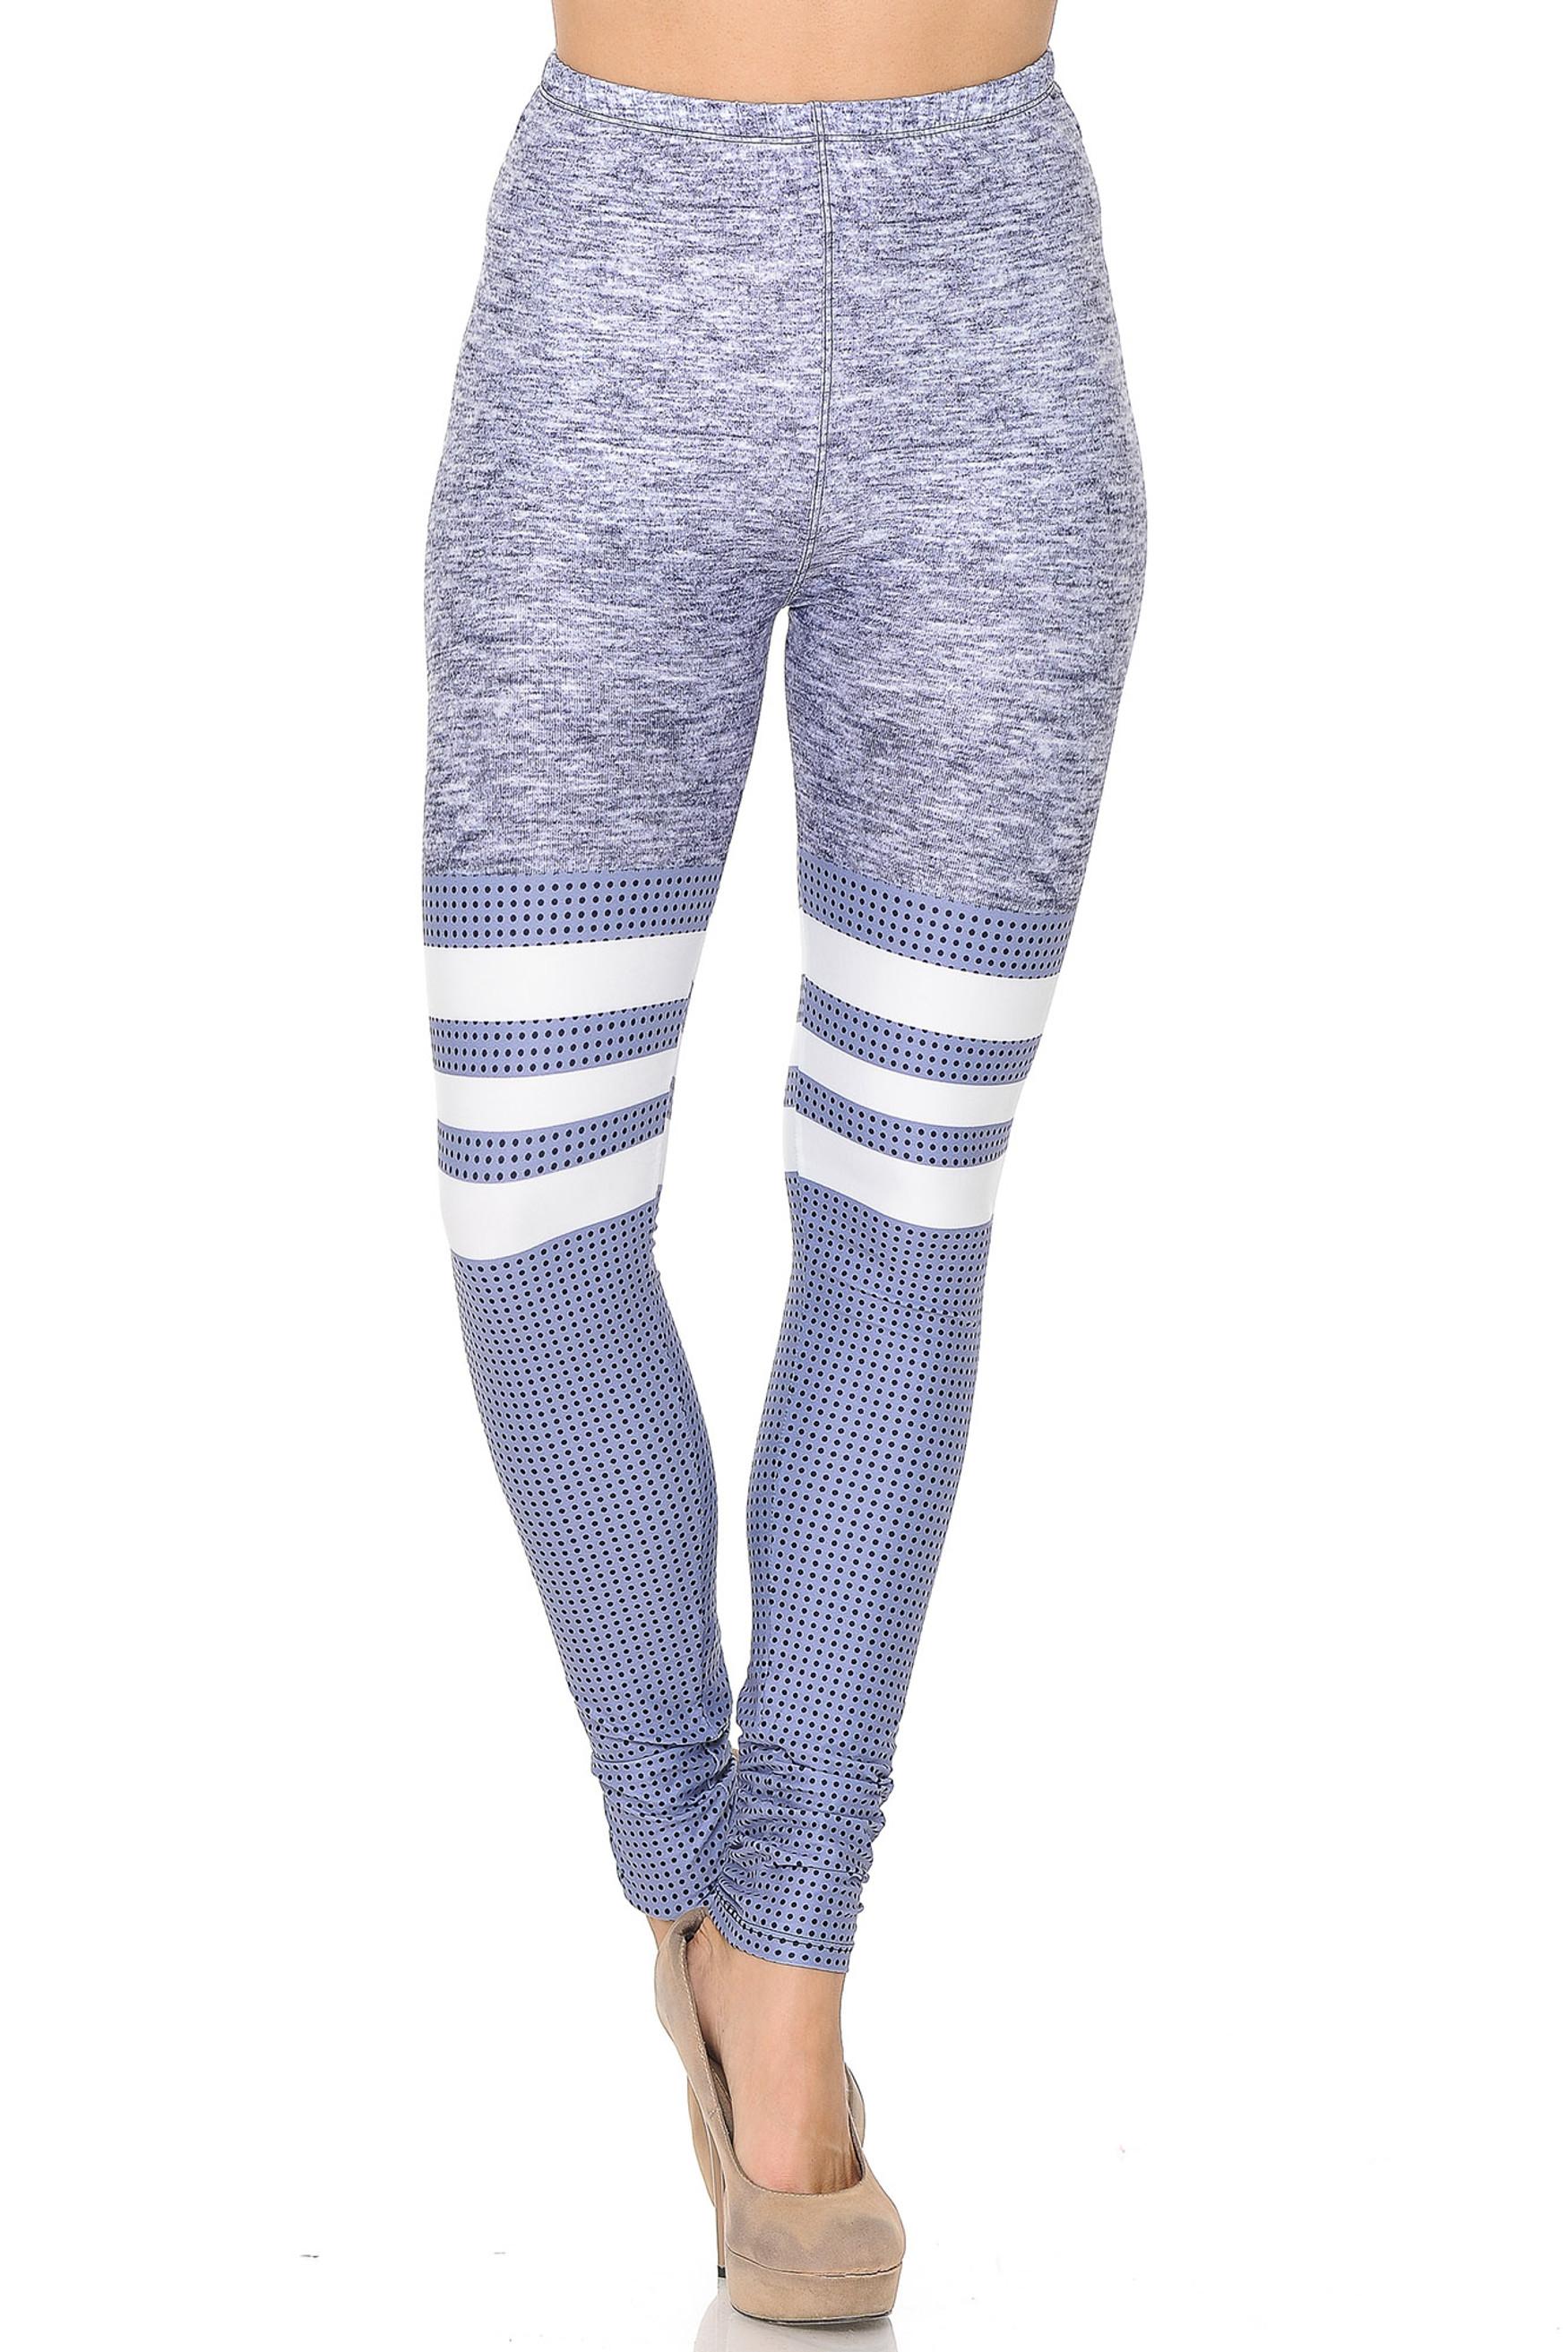 Creamy Soft Split Sport Light Heathered Extra Small Leggings - USA fashion™